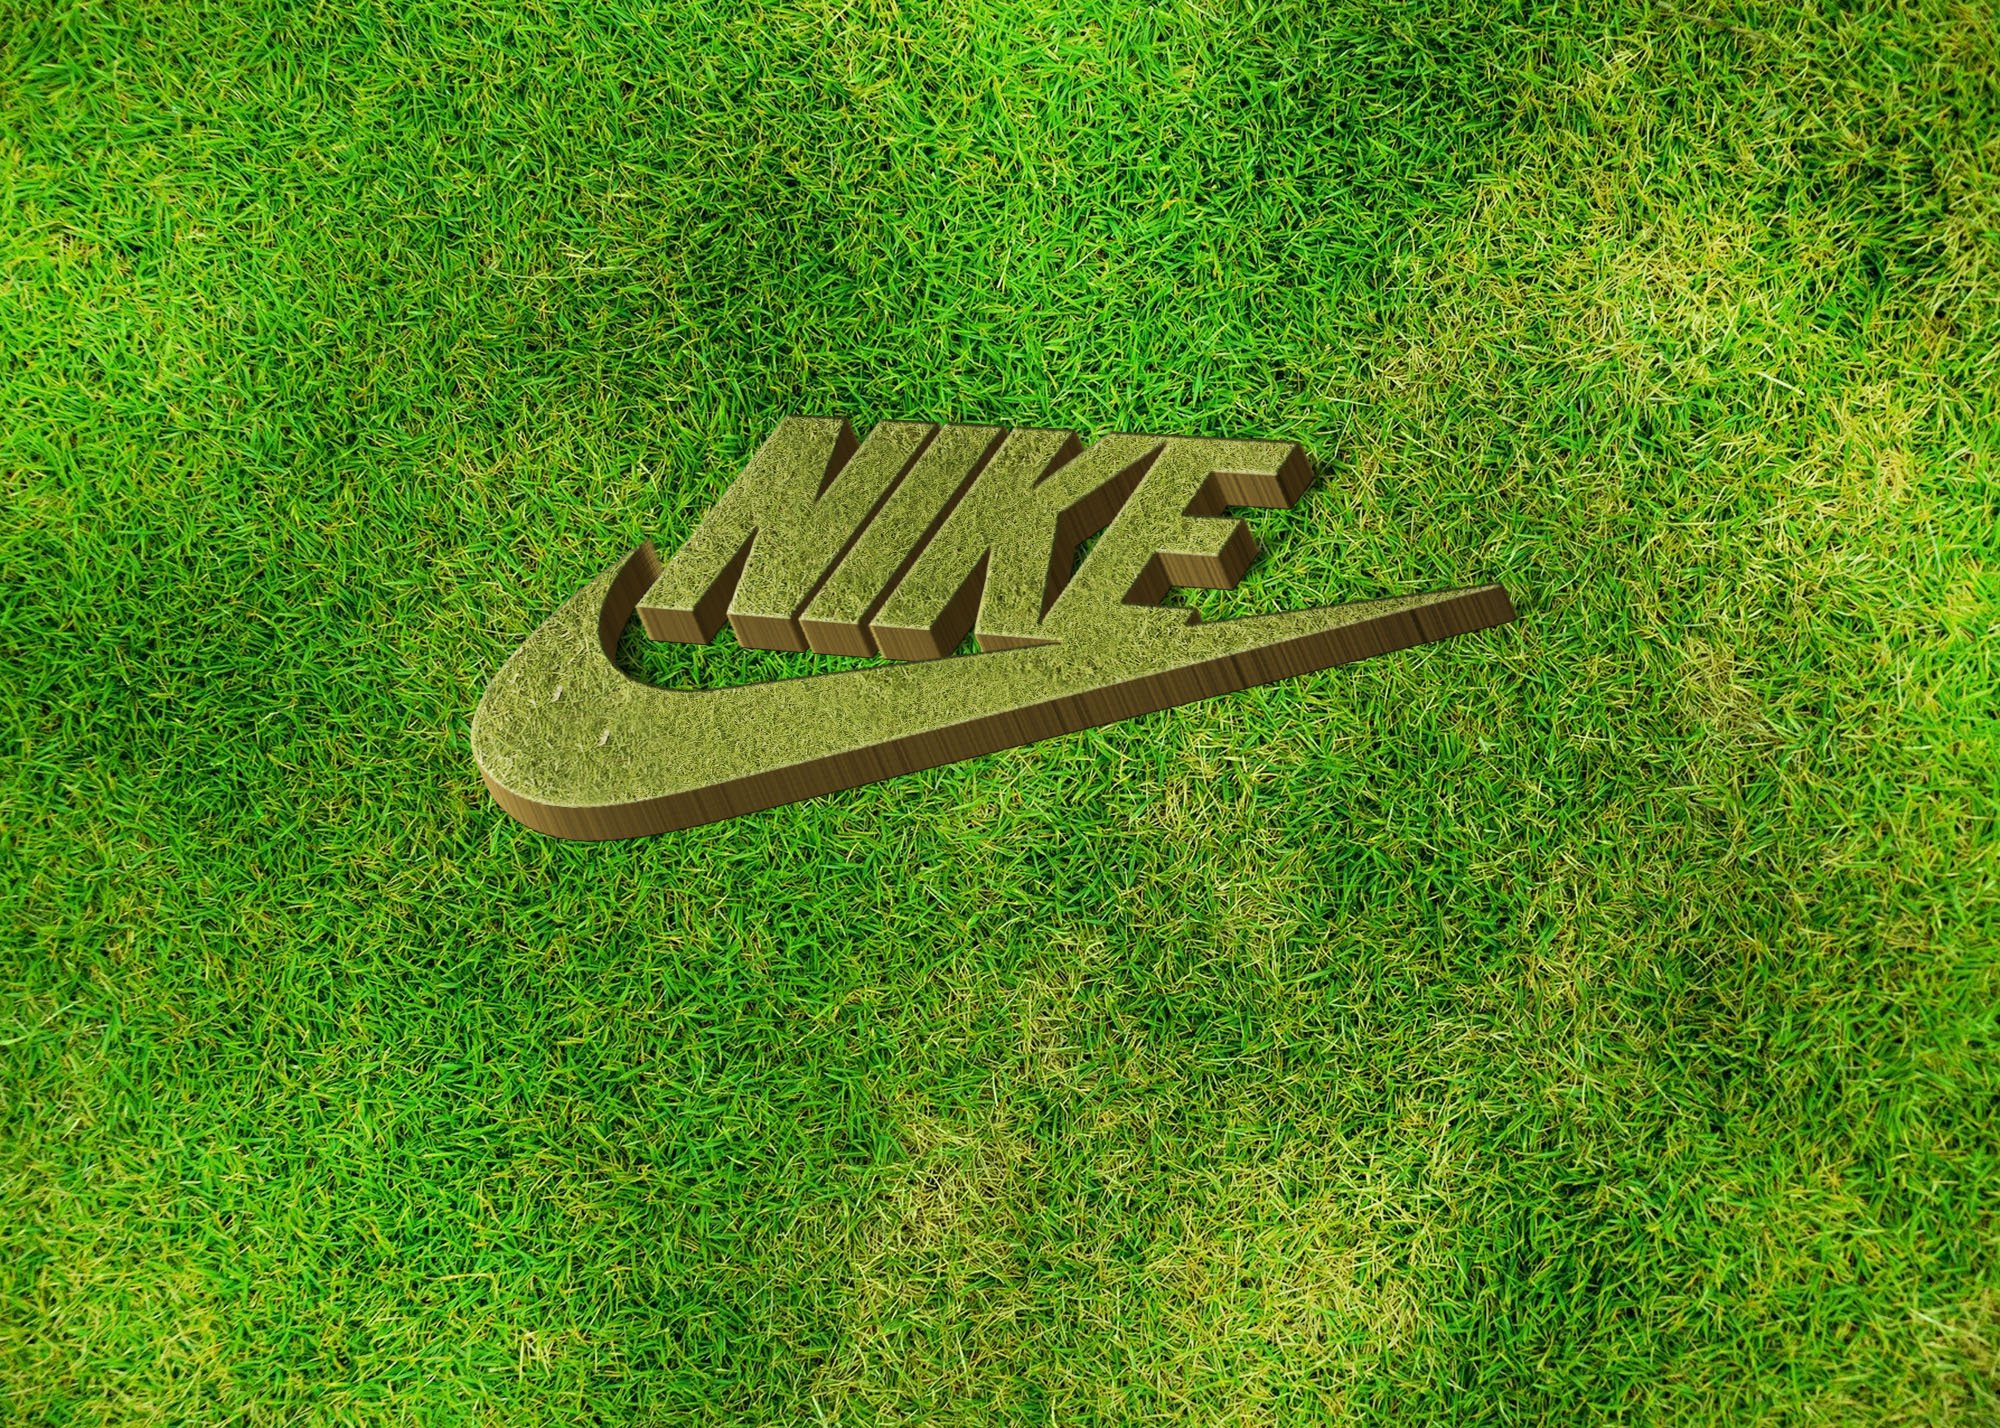 Nike on 3d grass mockup